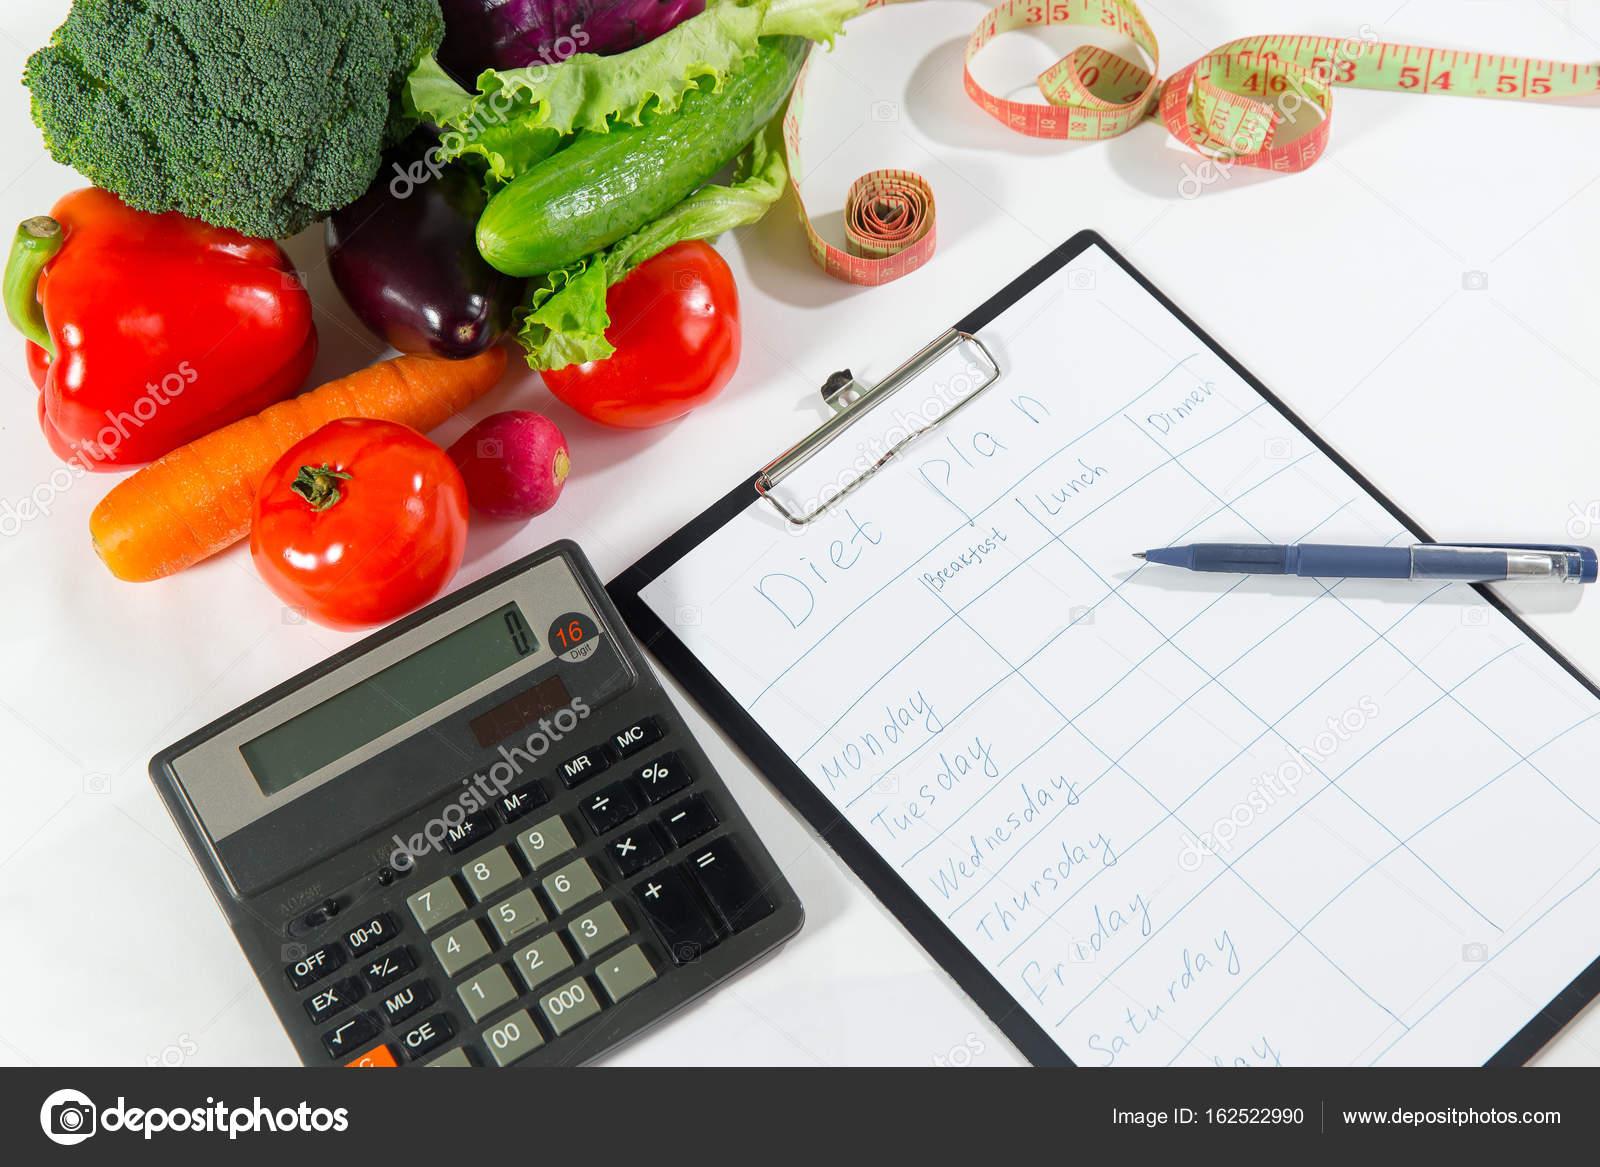 Калькулятор Для Похудения И Диета. Калькулятор калорий для похудения онлайн